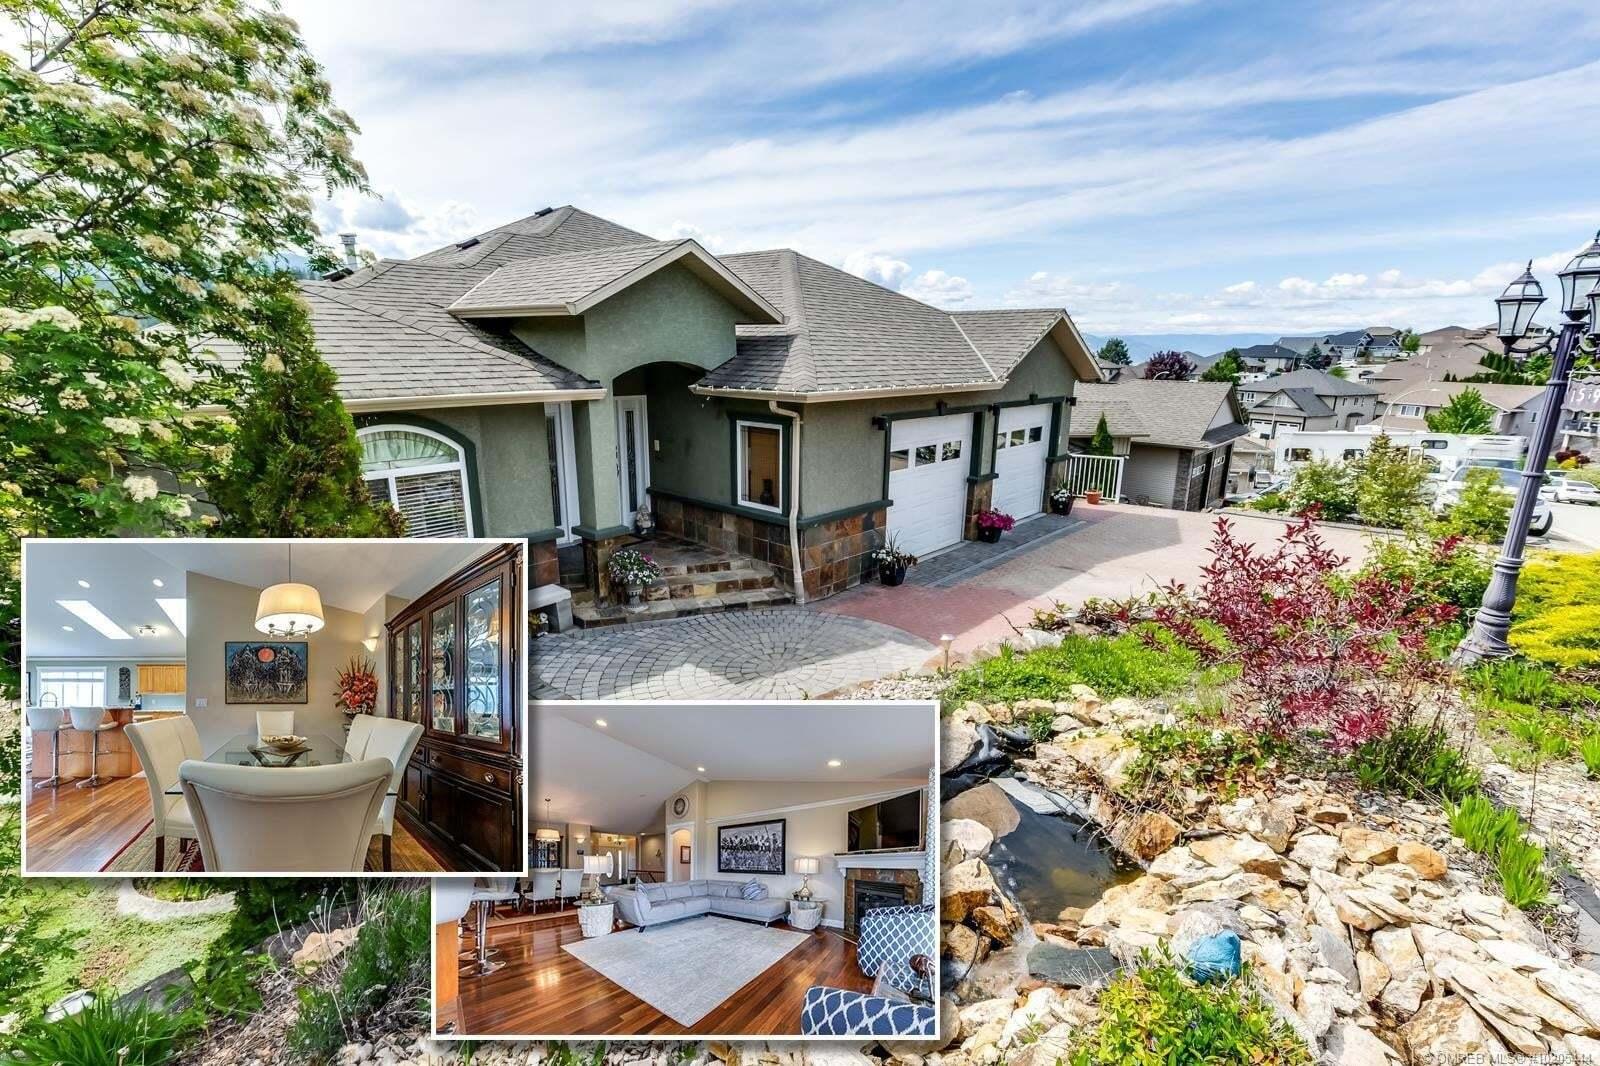 House for sale at 1519 Longley Cres Kelowna British Columbia - MLS: 10205444